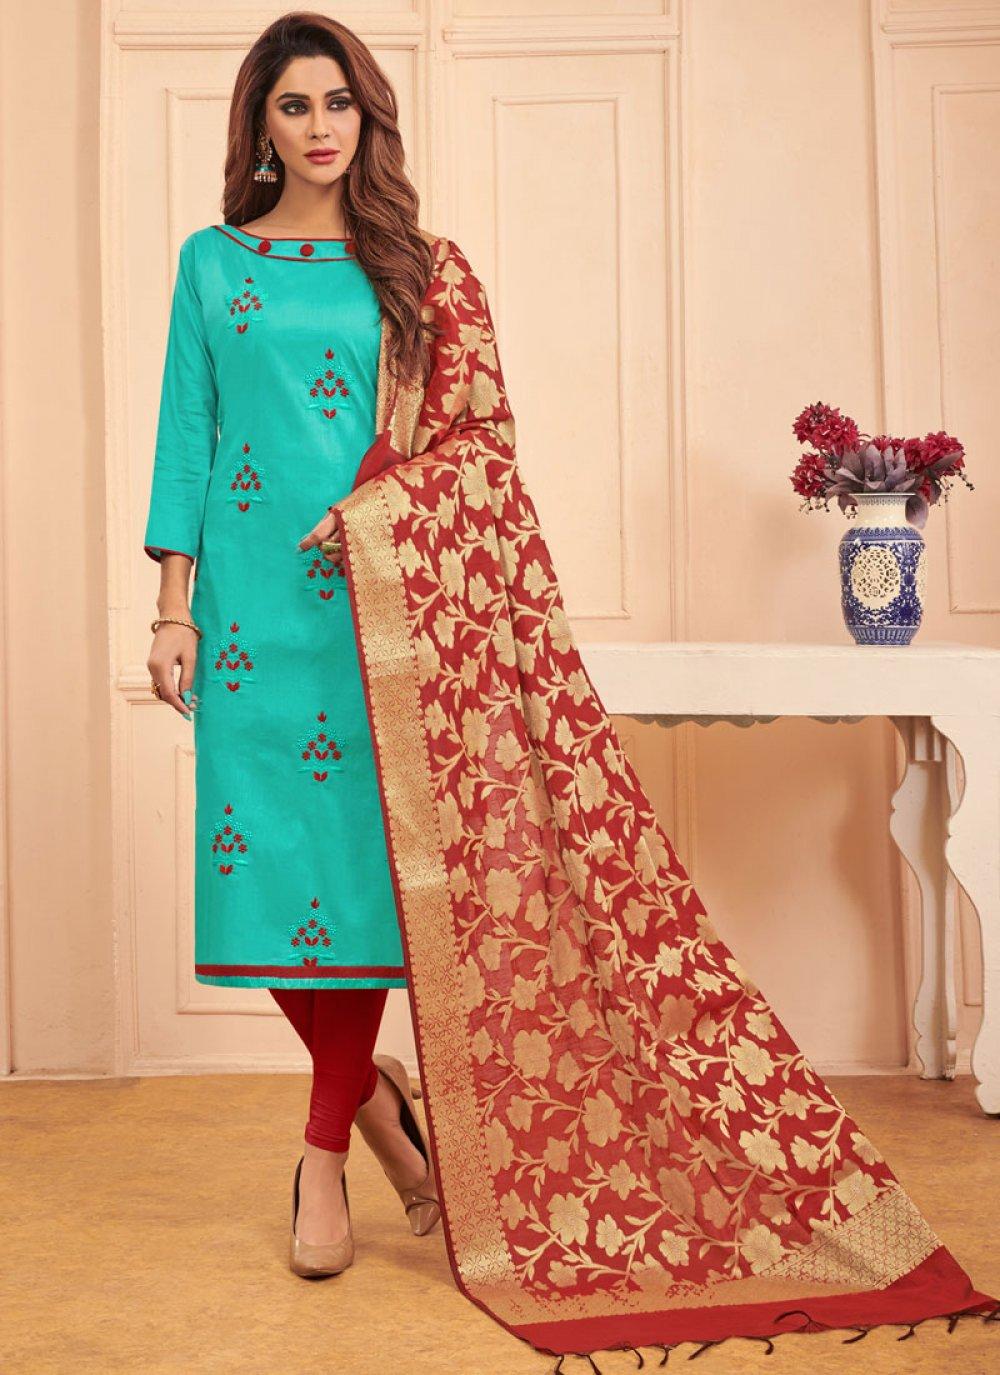 Aqua Blue Embroidered Cotton Churidar Salwar Kameez